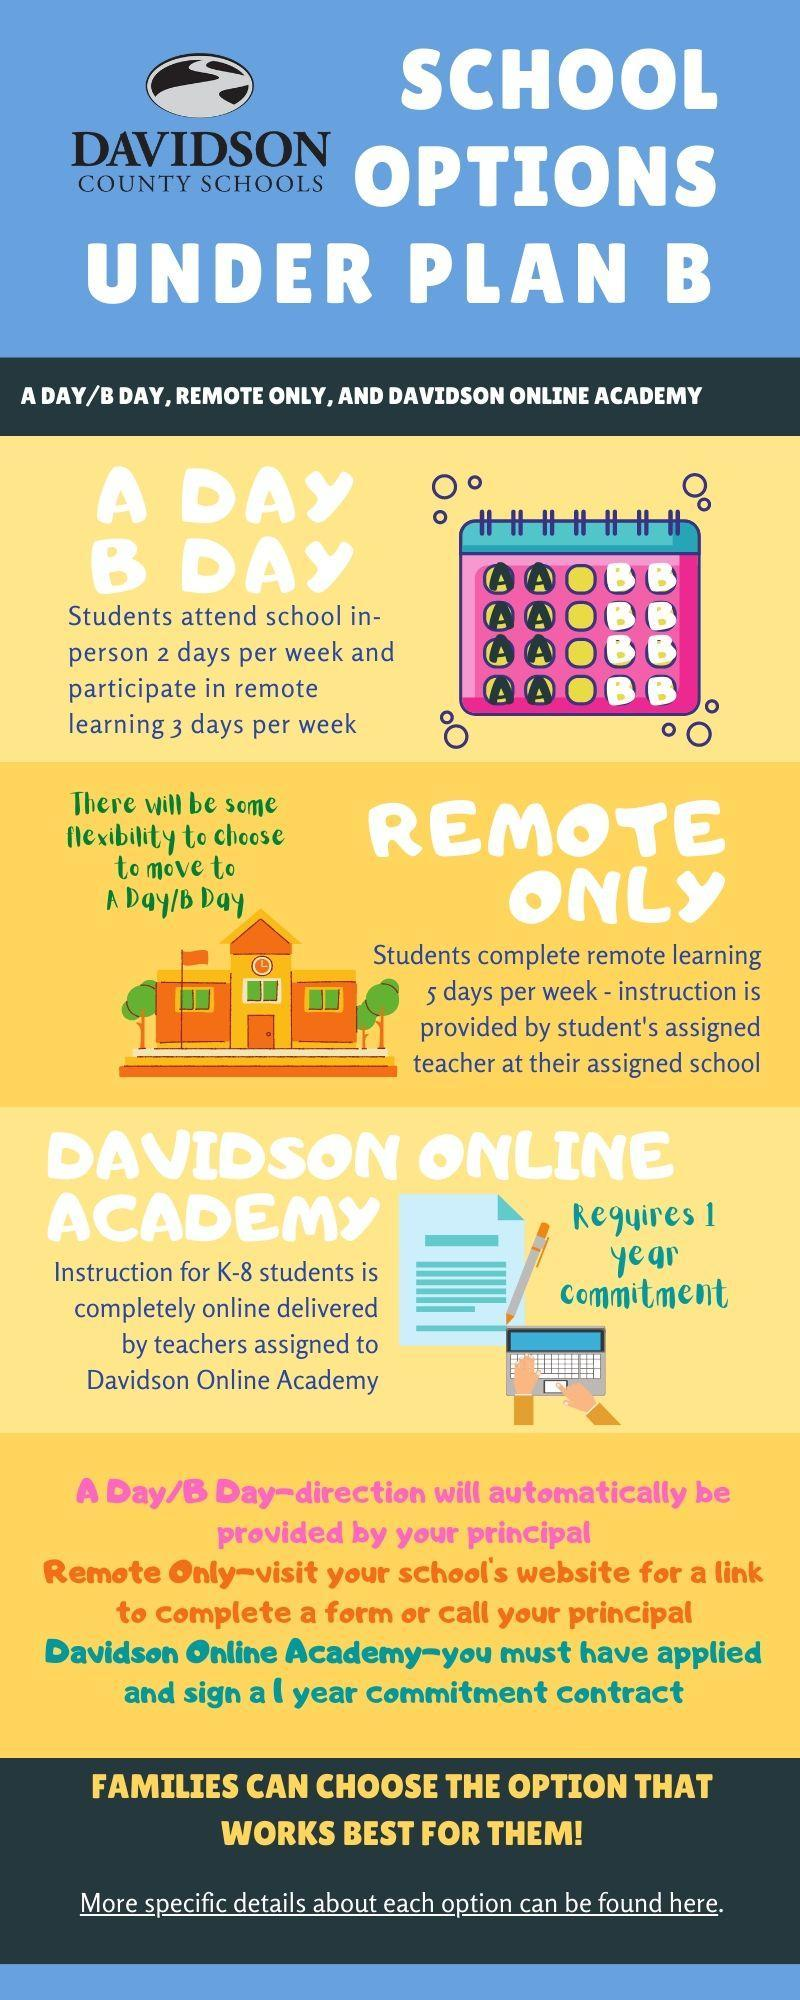 School Options for Plan B